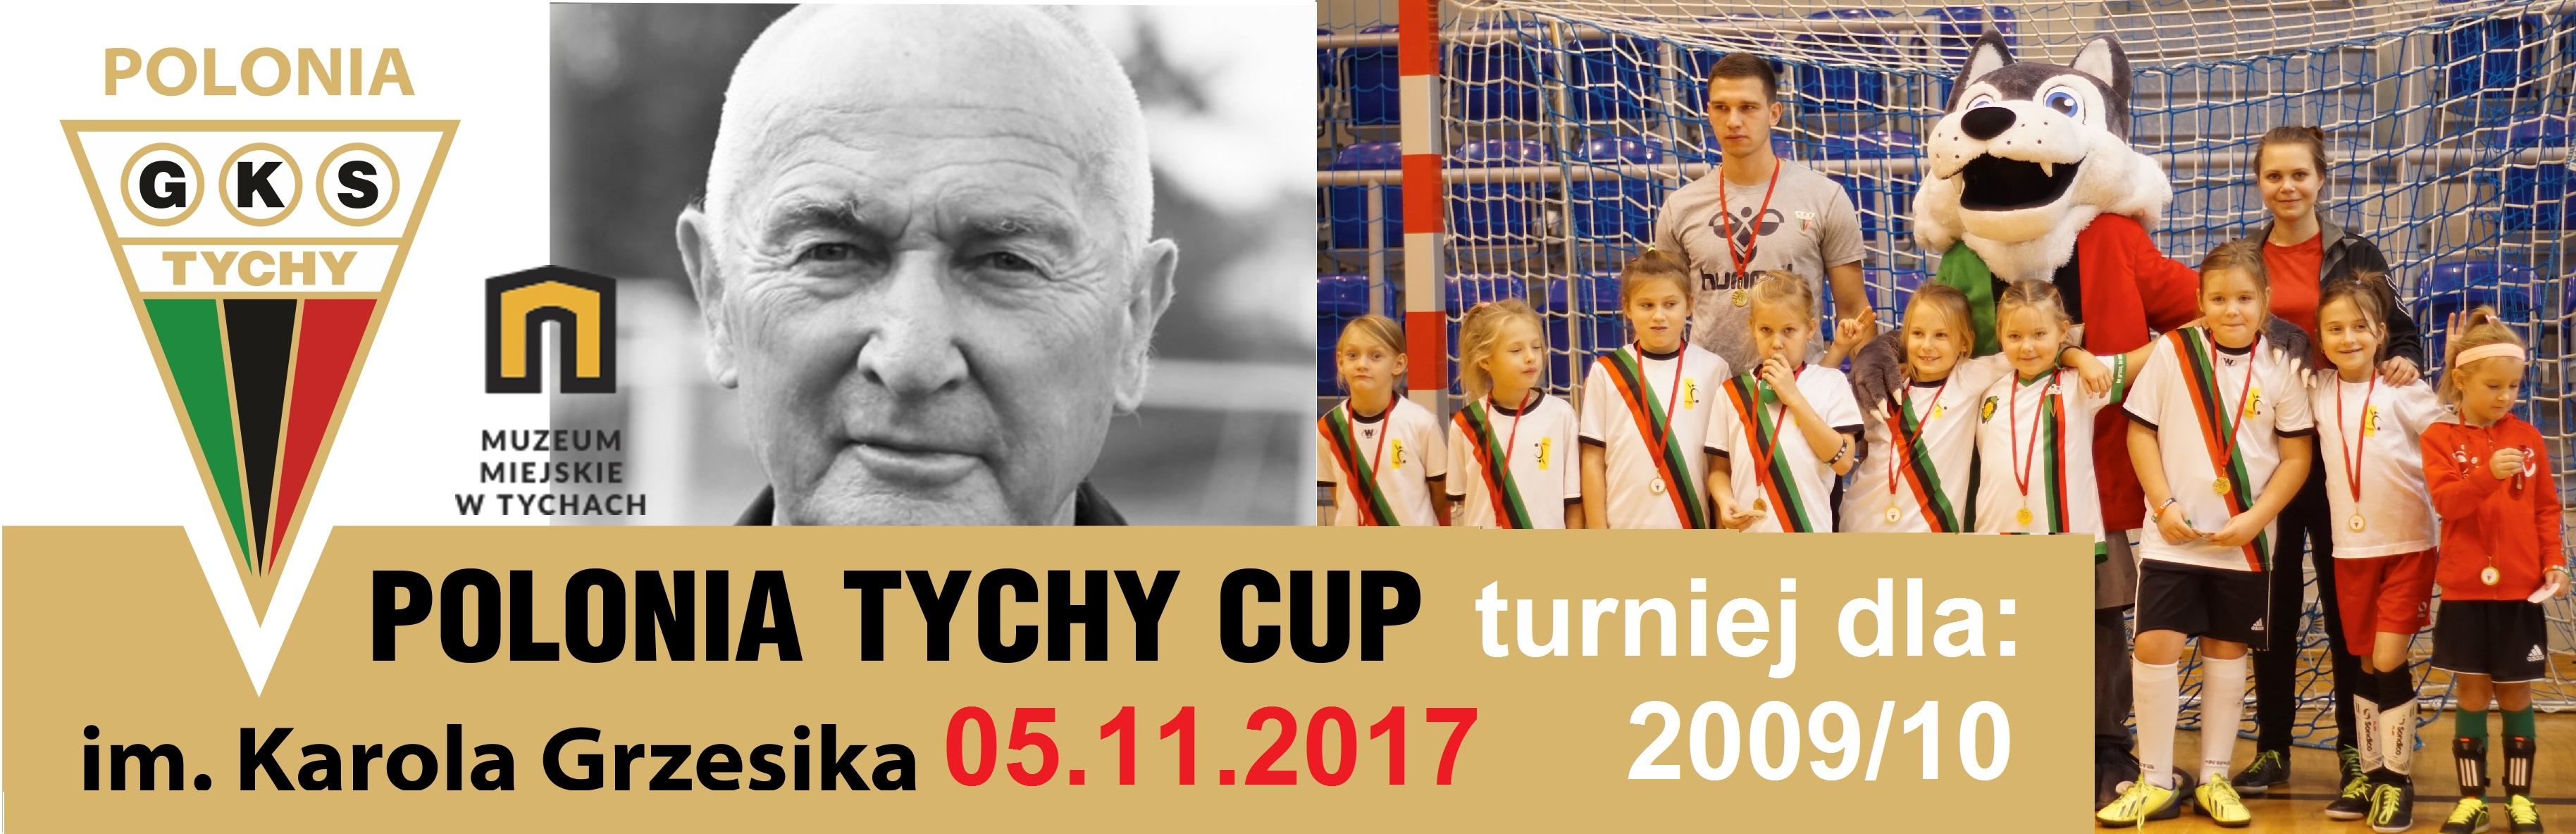 POlonacup2017-banerek2-2nowy